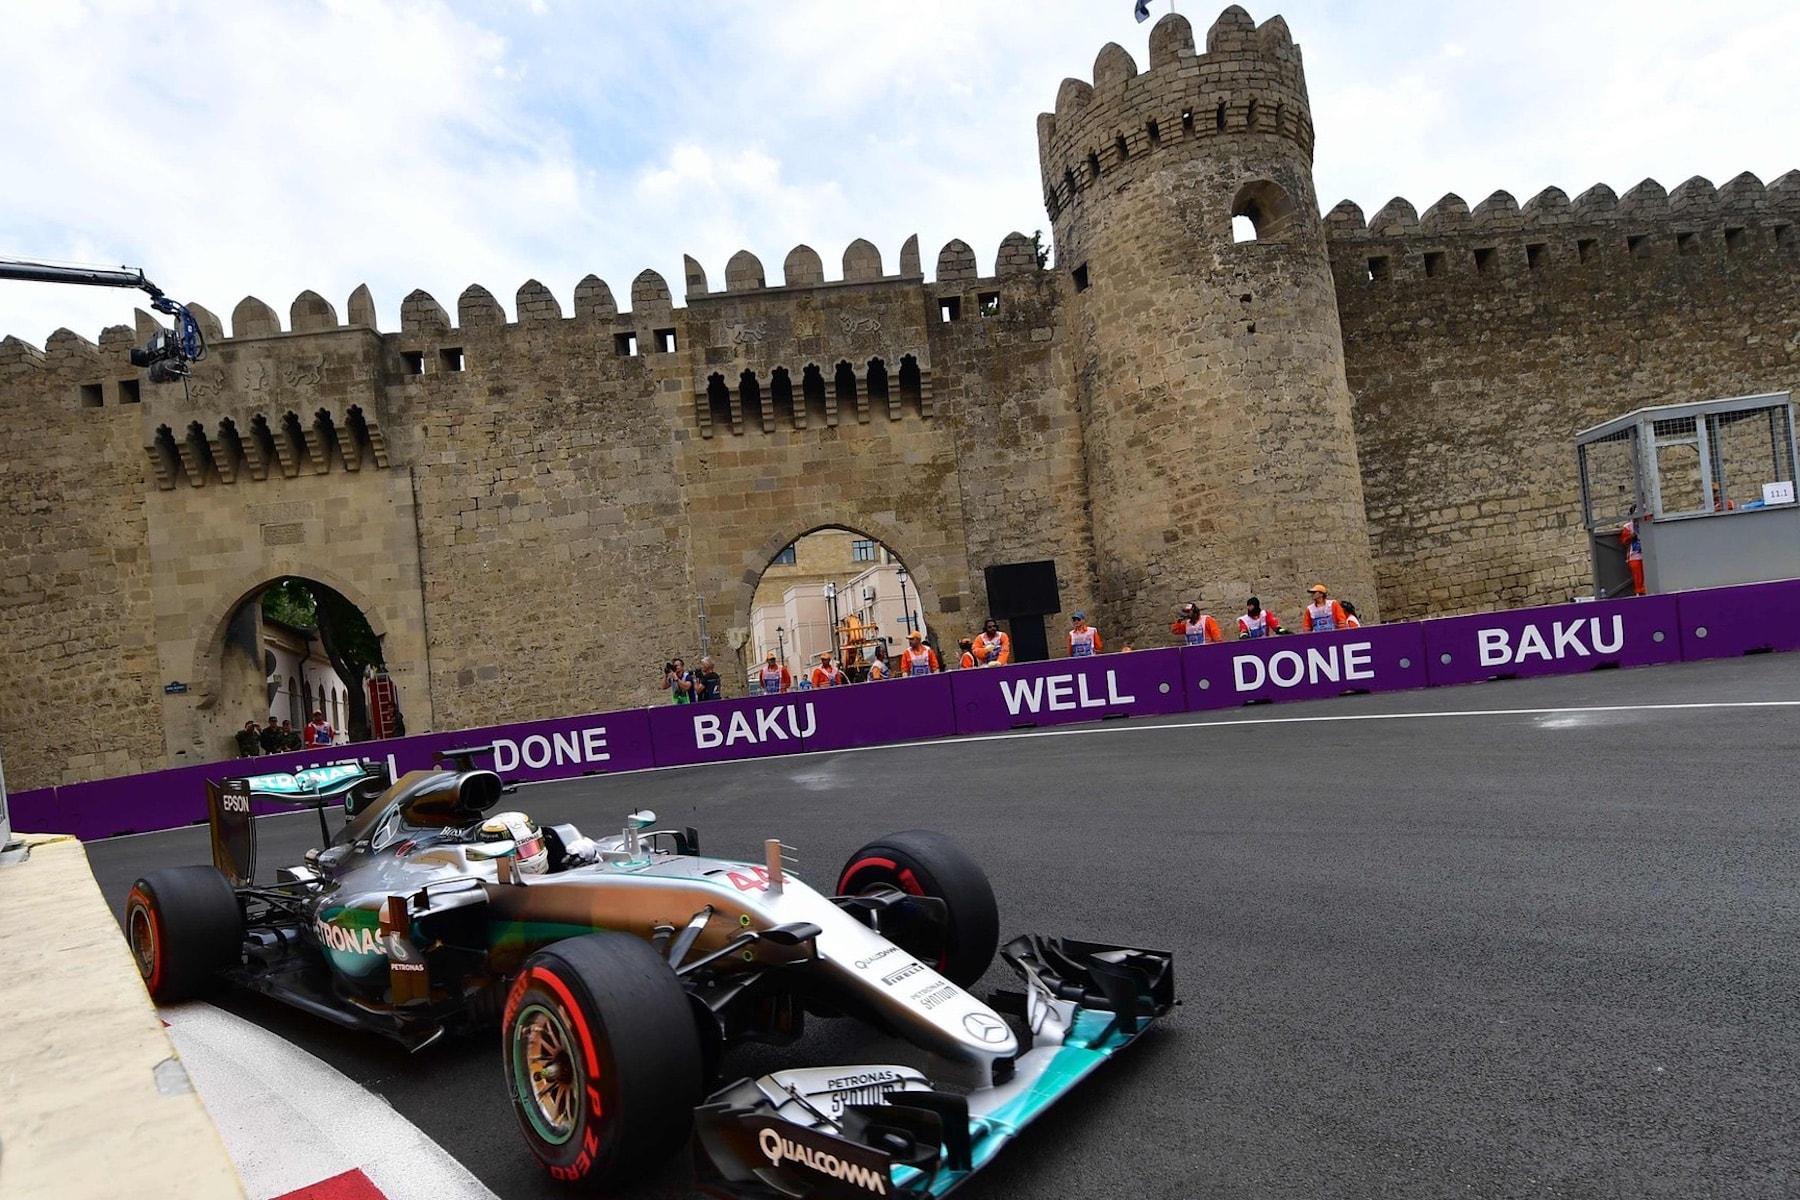 Salracing | Lewis Hamilton | Mercedes AMG Petronas